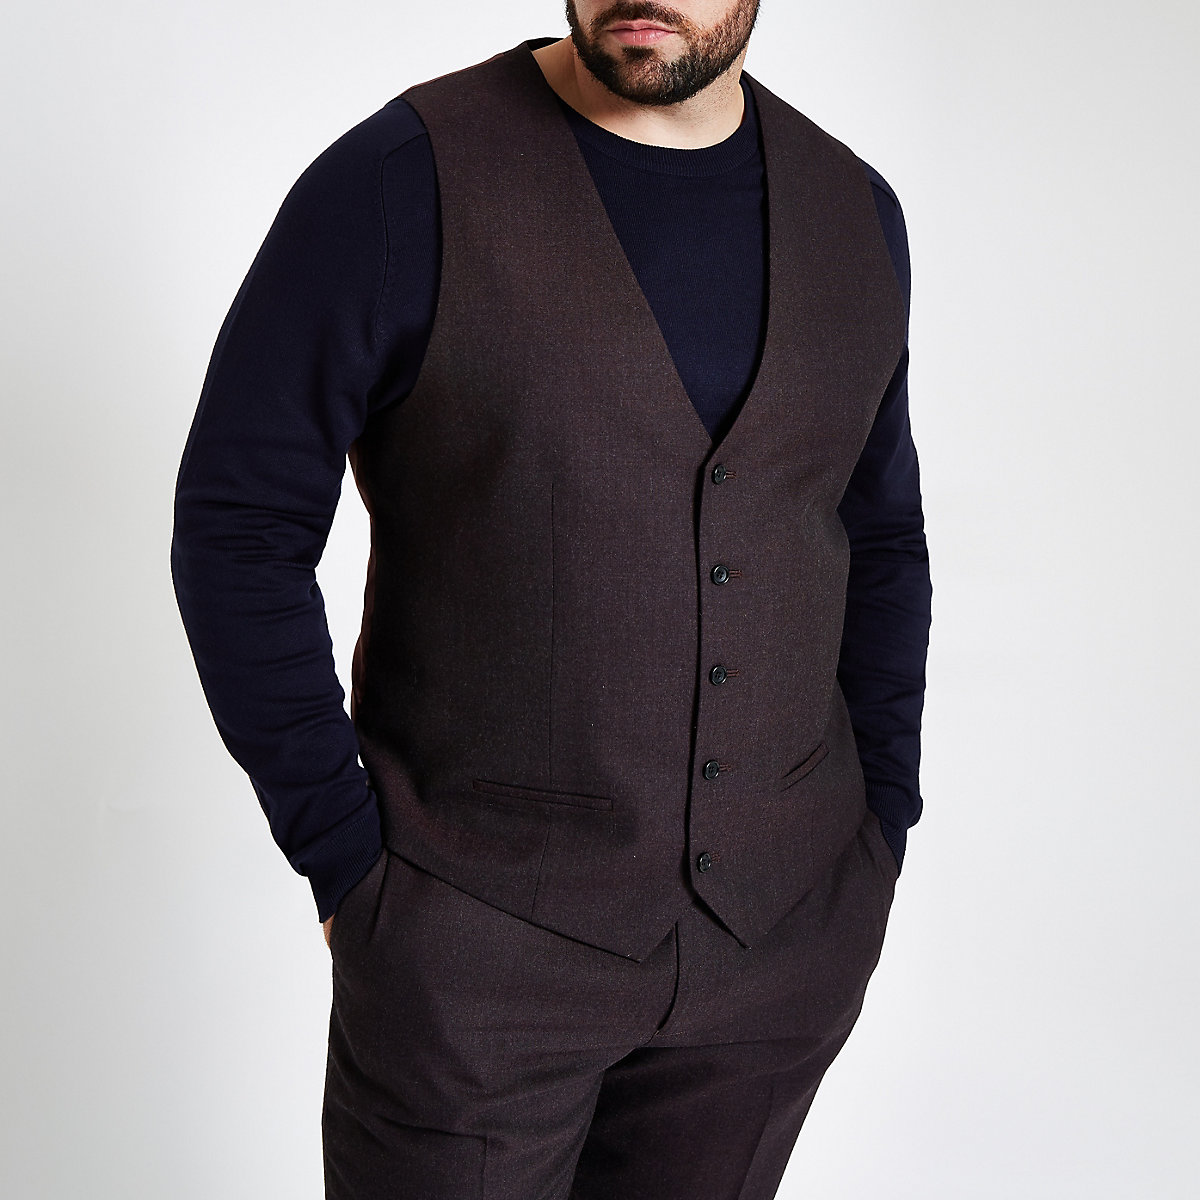 Big and Tall purple vest